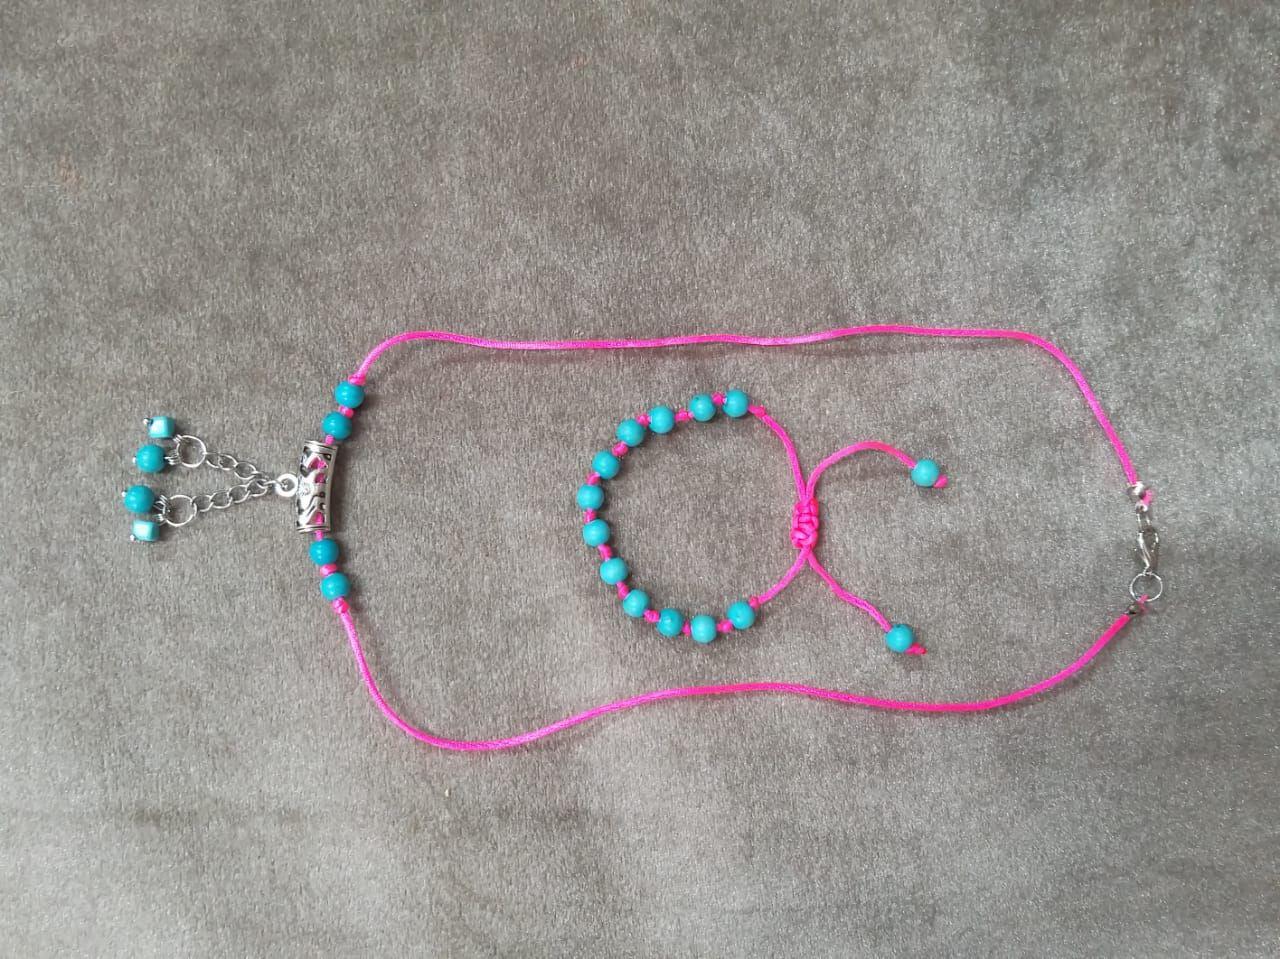 اكسسوارات أطفال Jewelry Handmade Bracelets